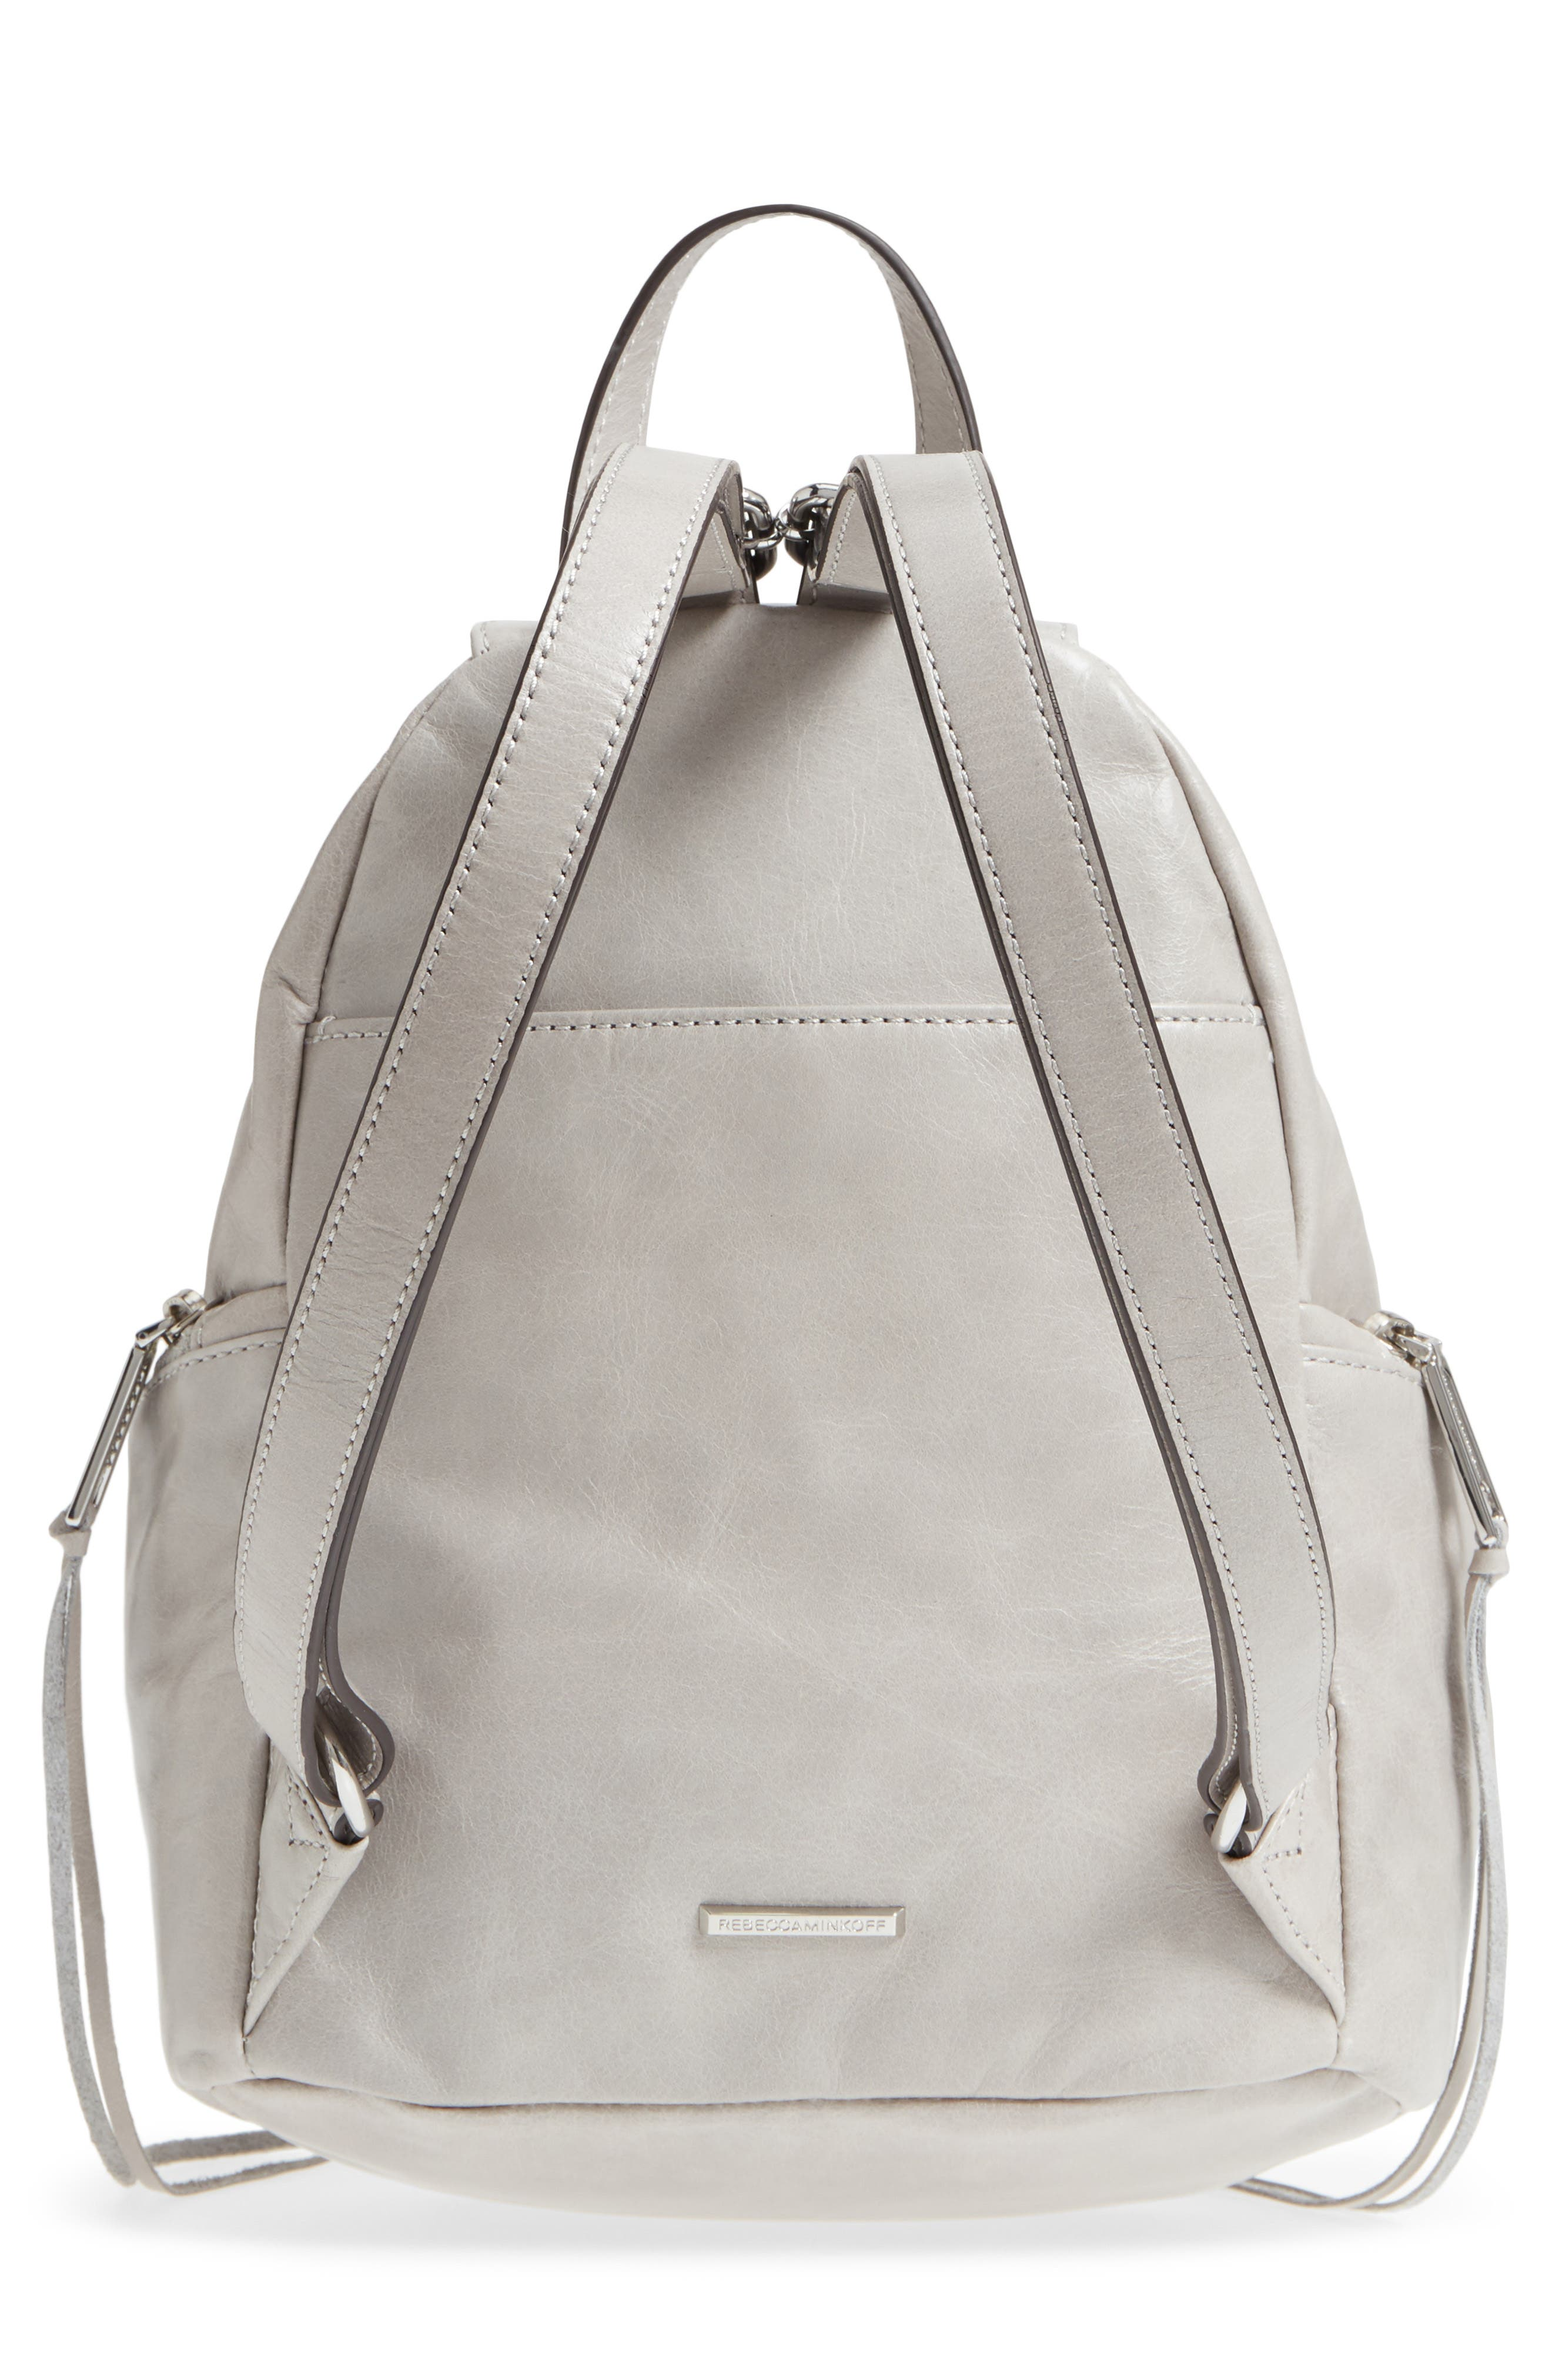 Medium Julian Leather Backpack,                             Alternate thumbnail 3, color,                             090